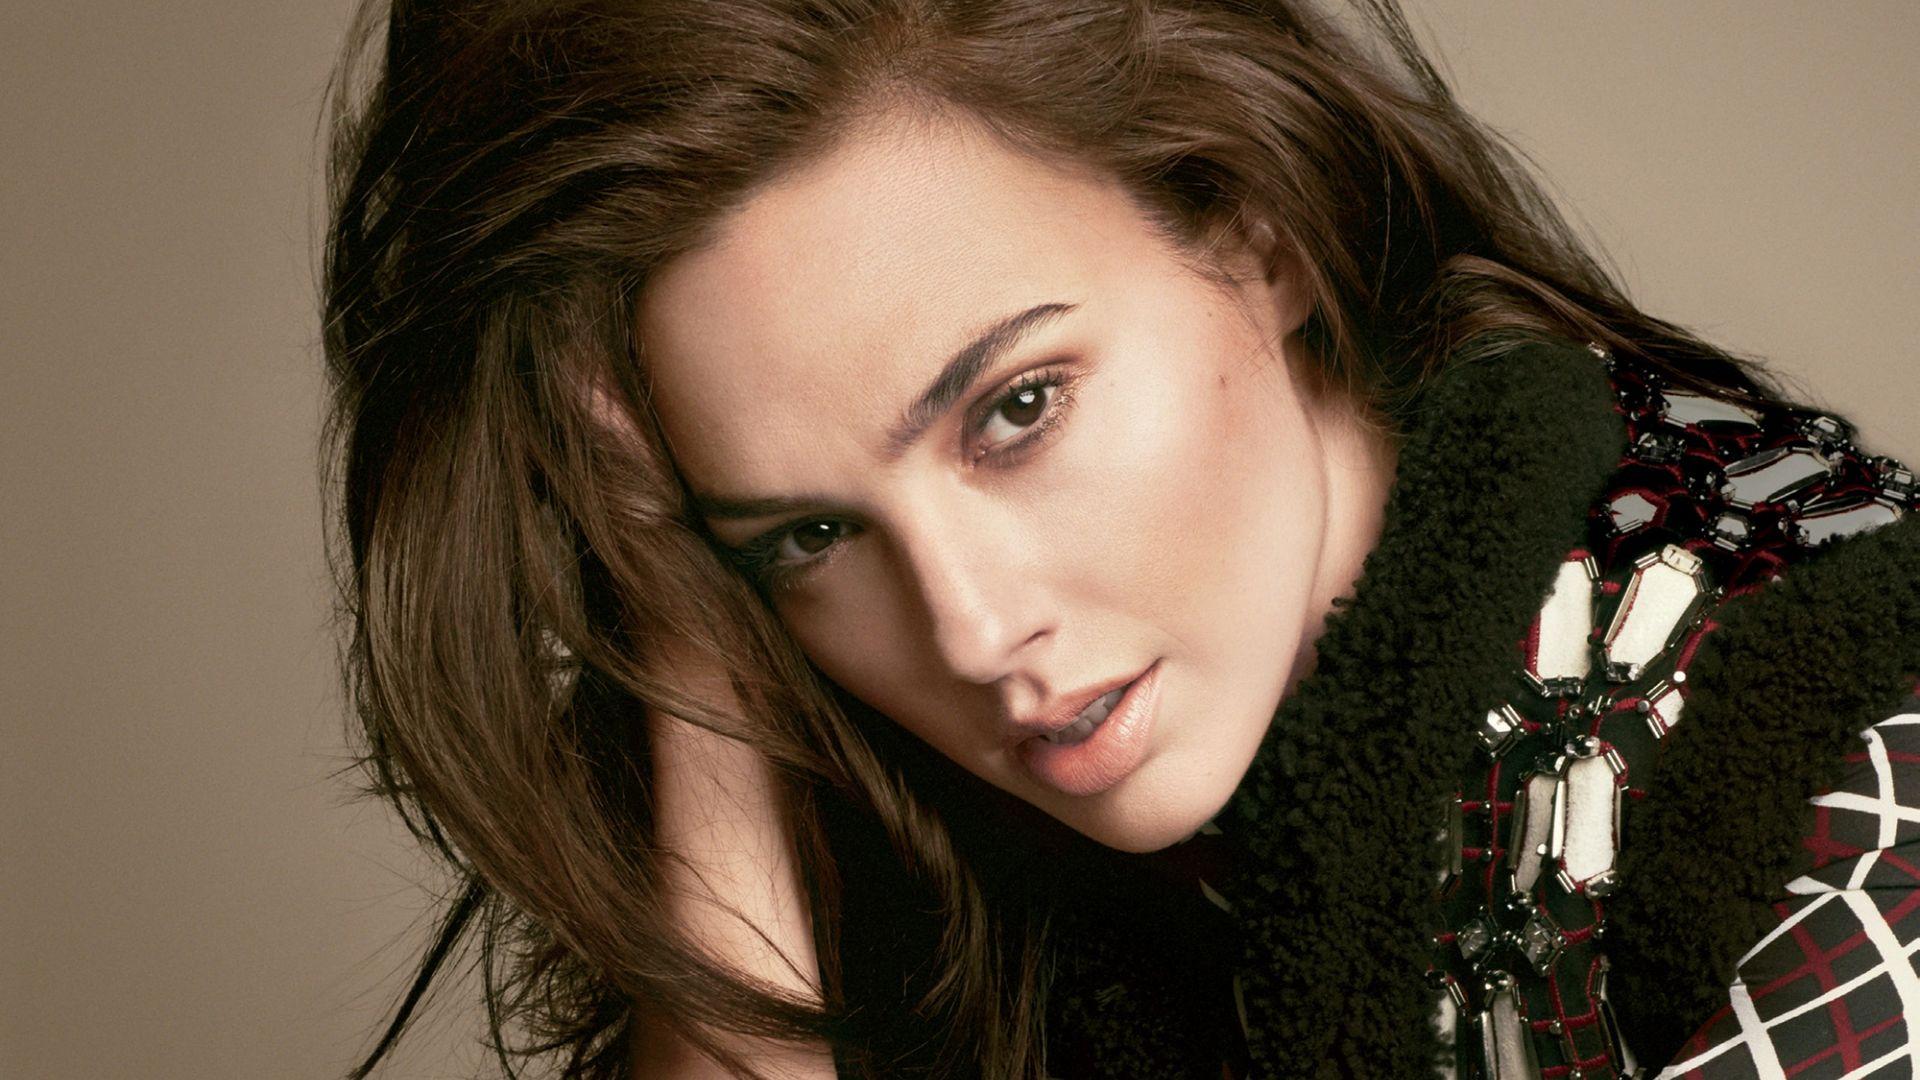 Wallpaper Gal Gadot, Israeli actress, beautiful